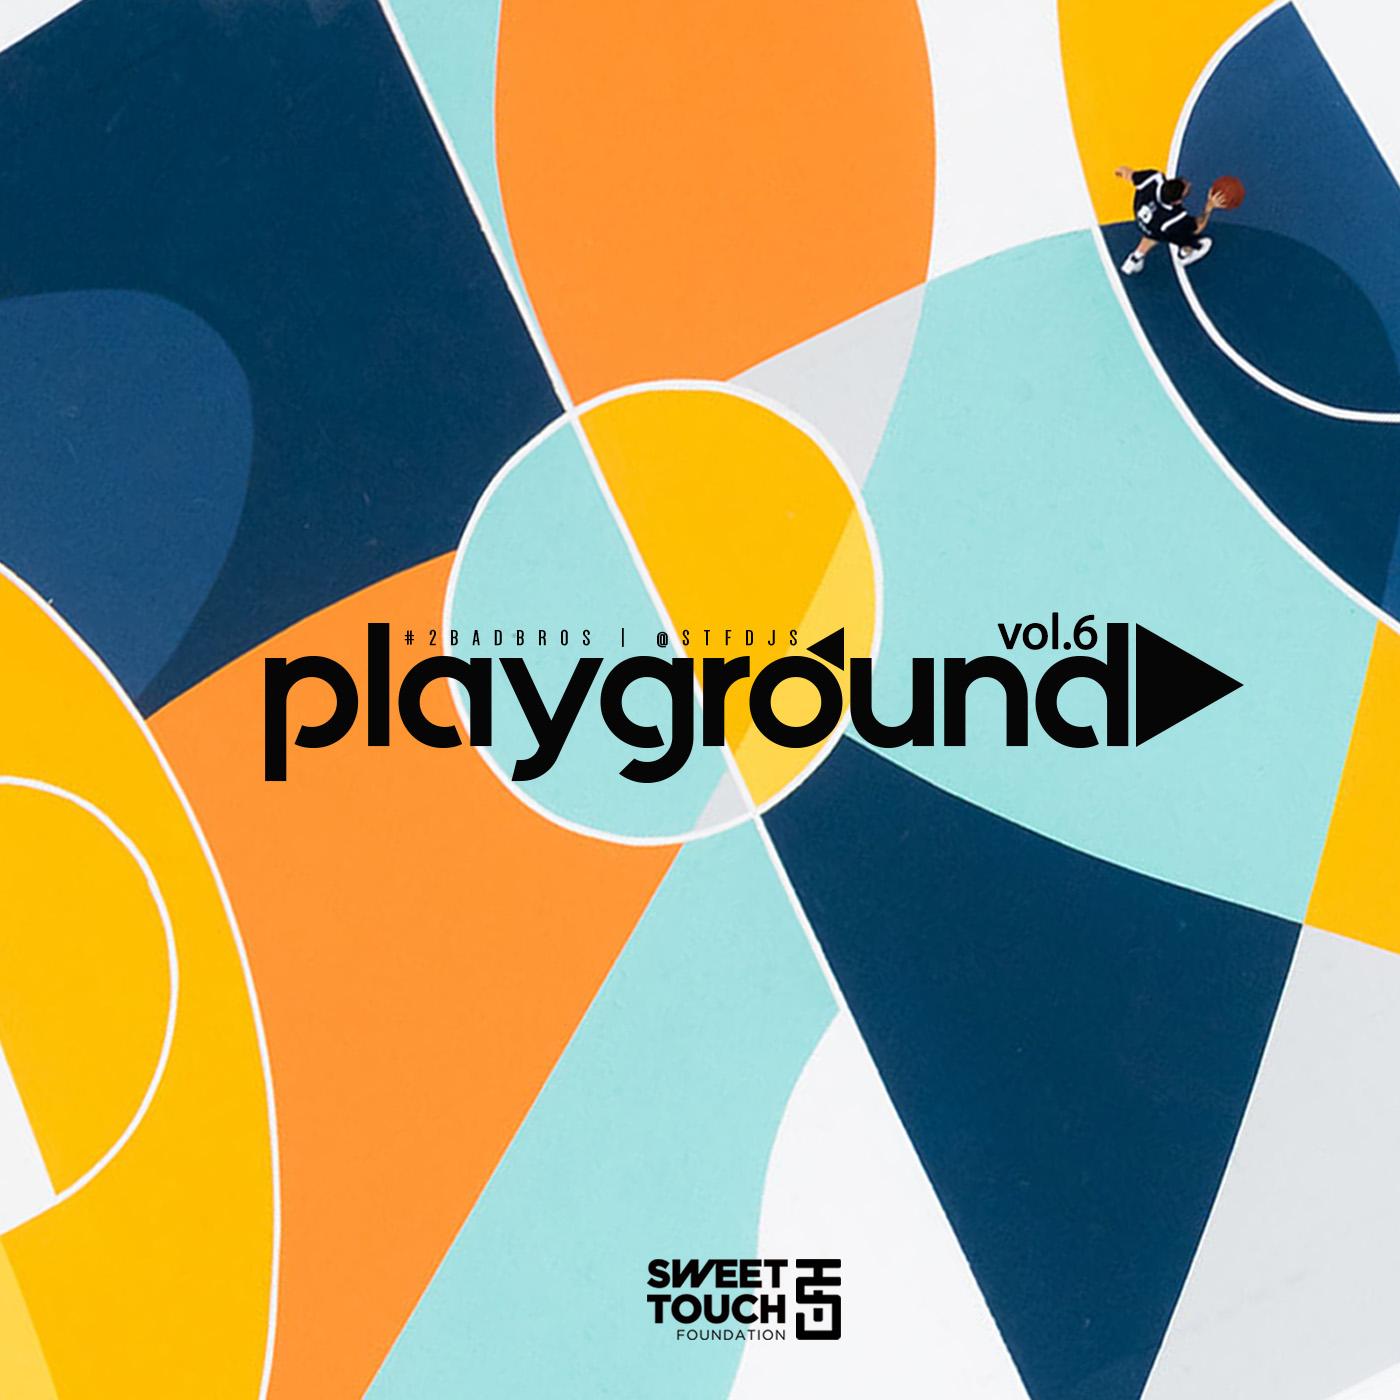 playground_vol6.jpg